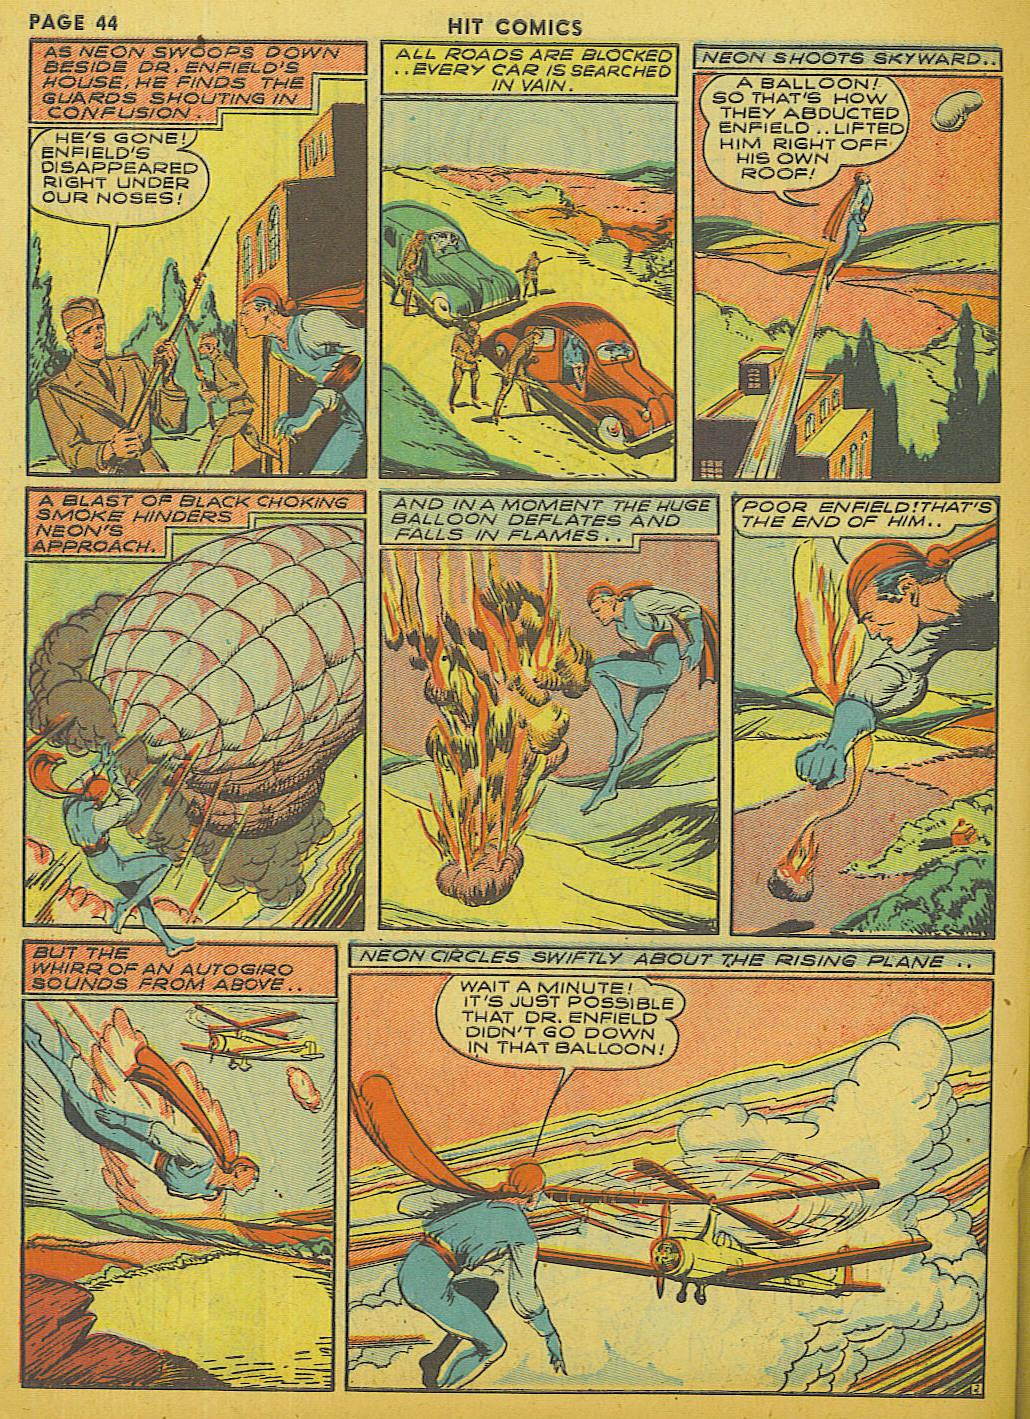 Read online Hit Comics comic -  Issue #13 - 46